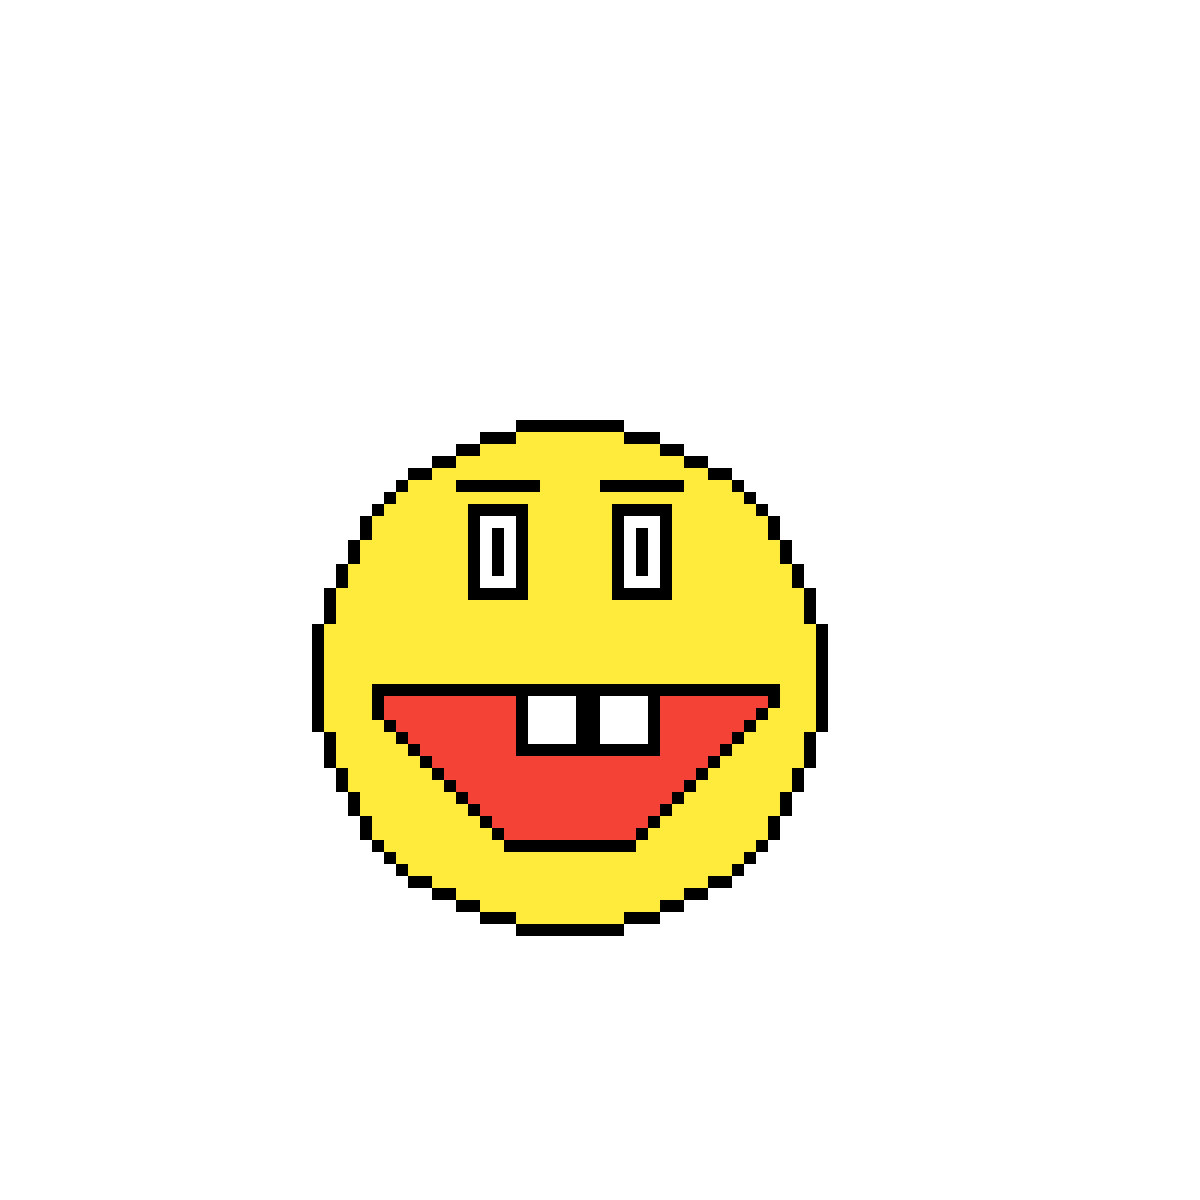 Pixilart Emoji Face Xd By Elsuciodan12